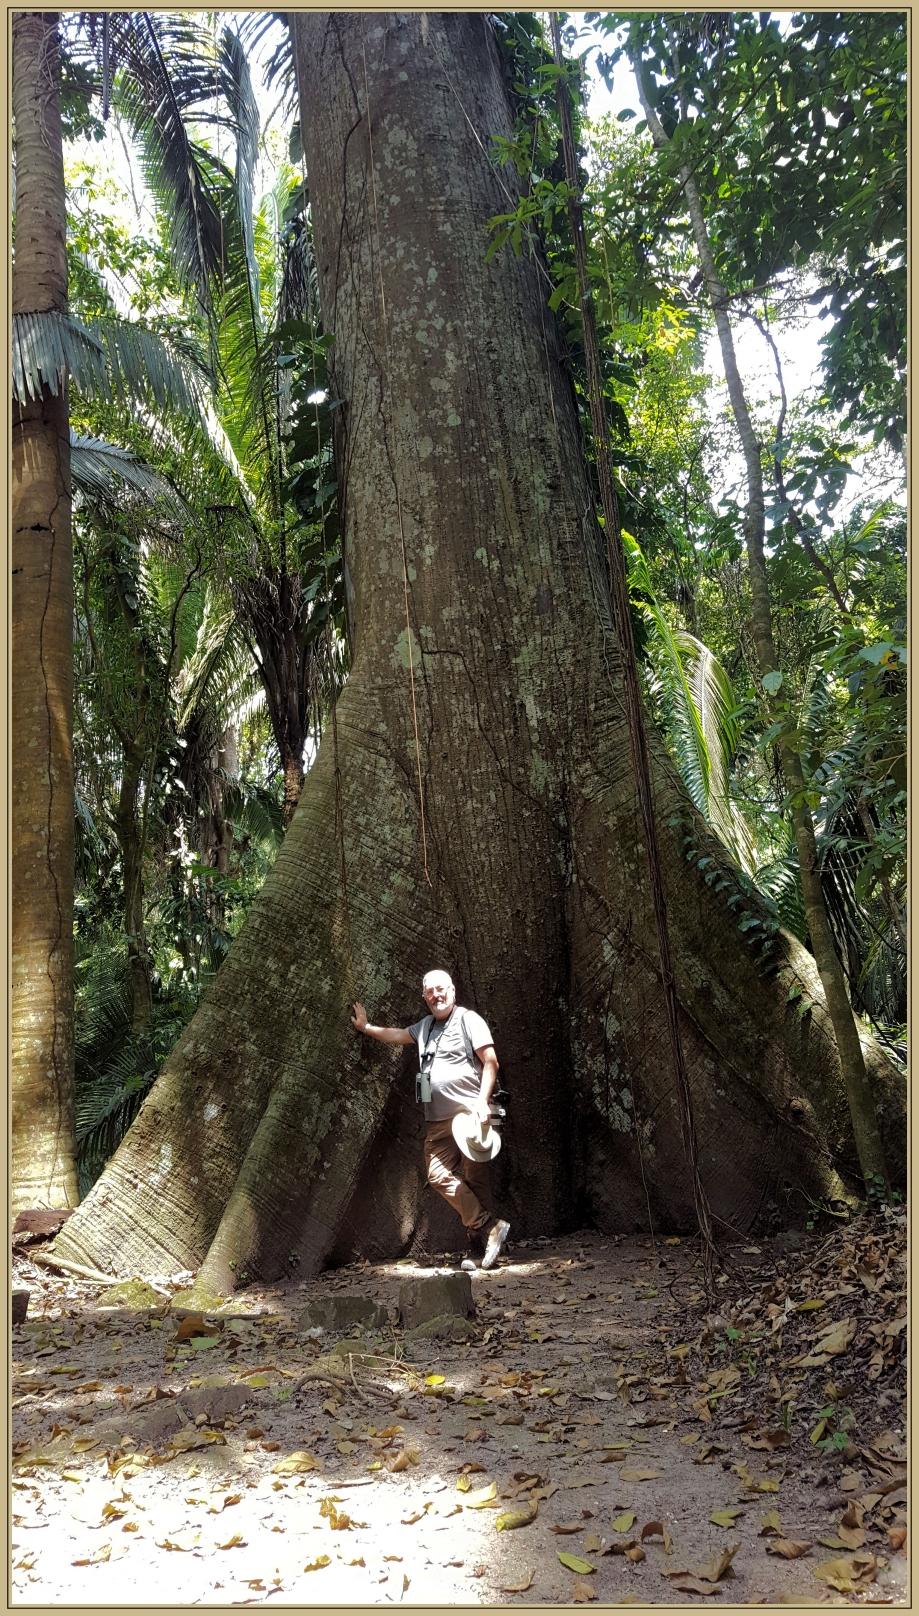 20170328_113546 arbre monumental.jpg